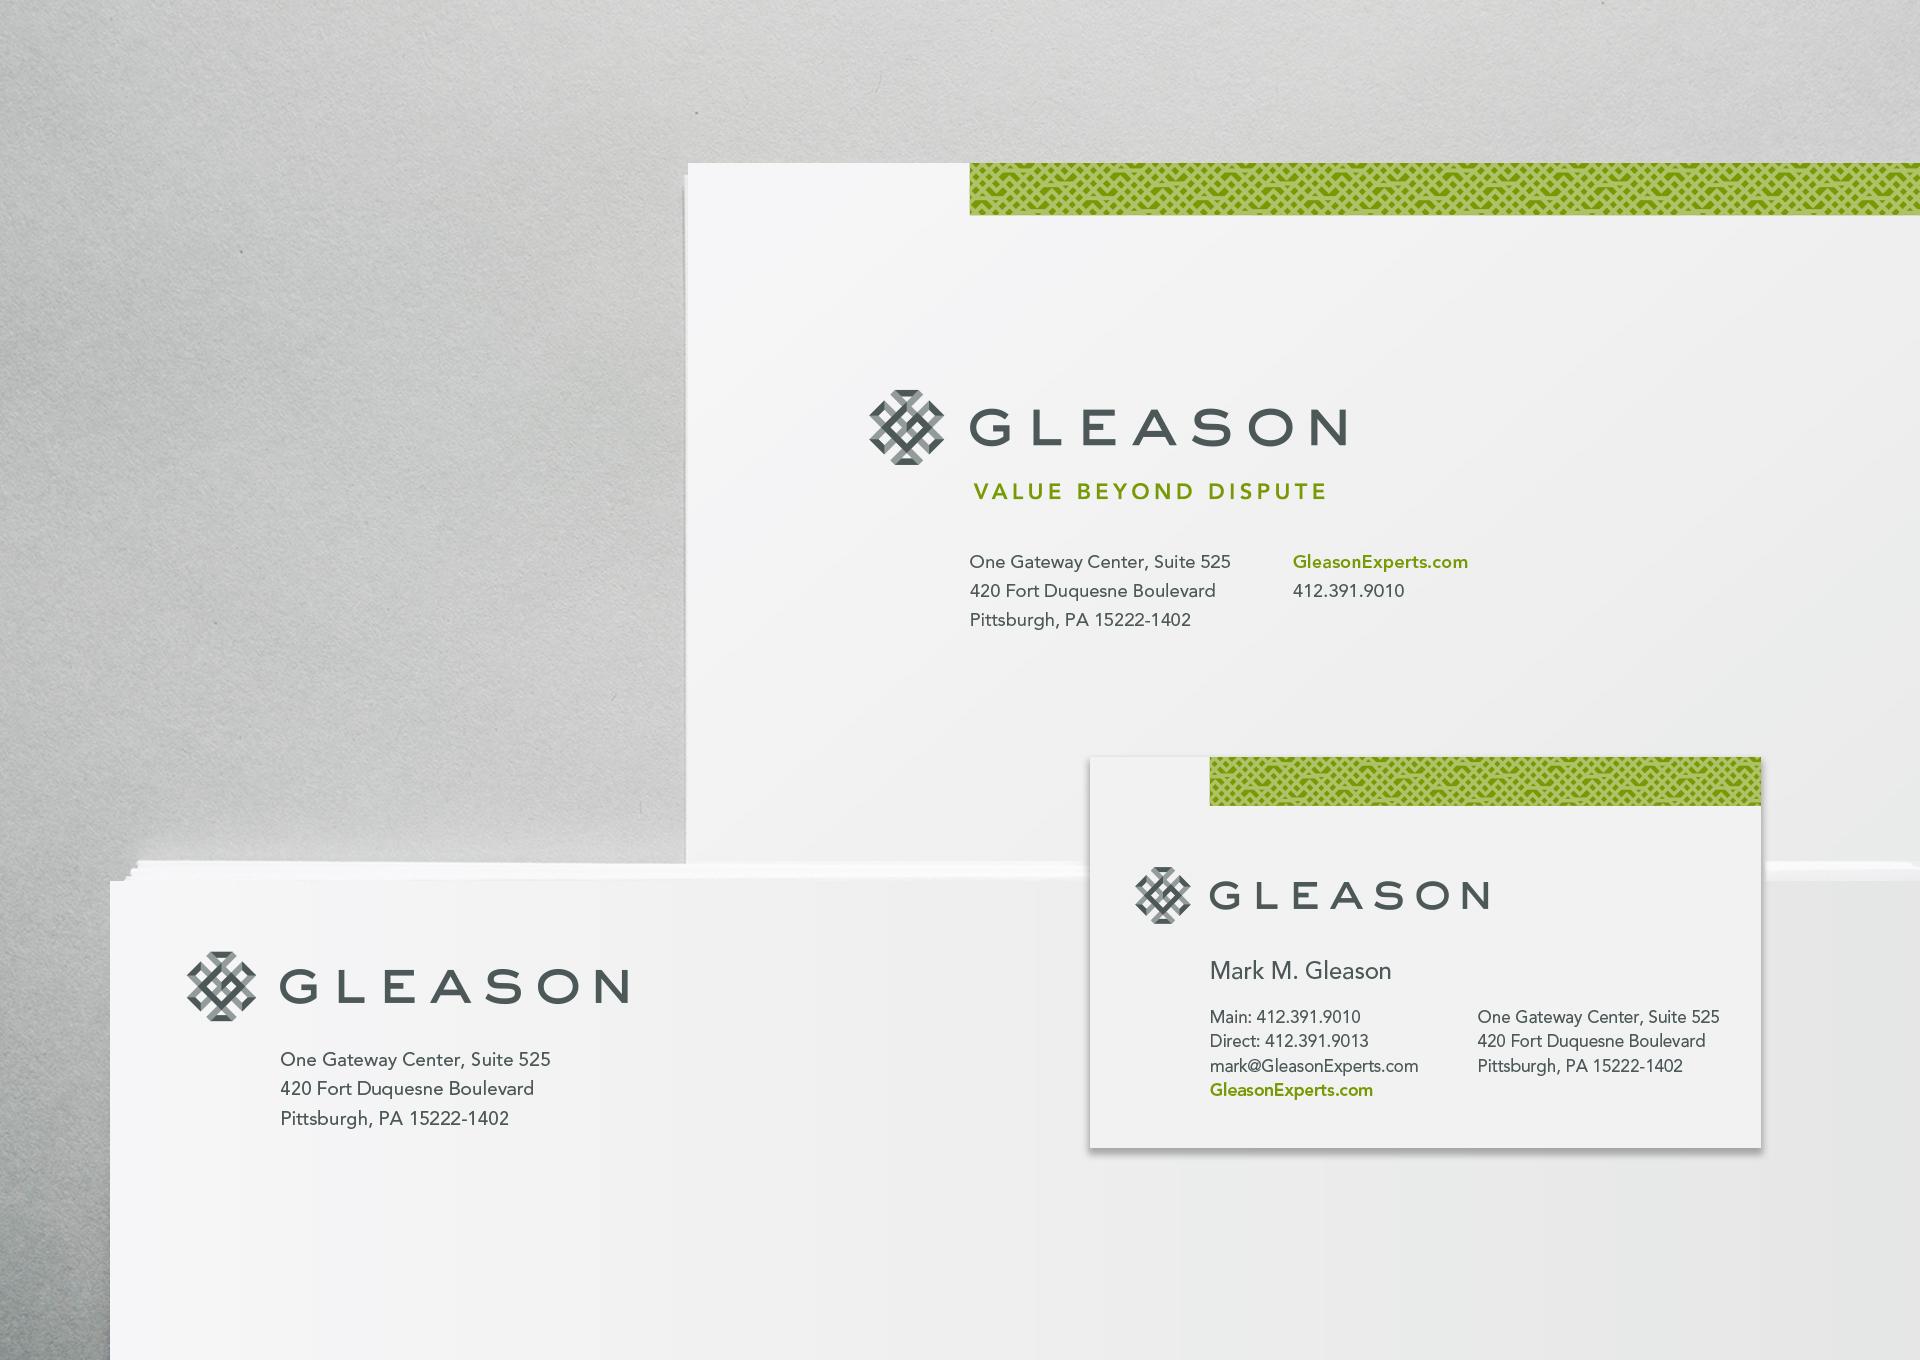 Gleason Brand stationery